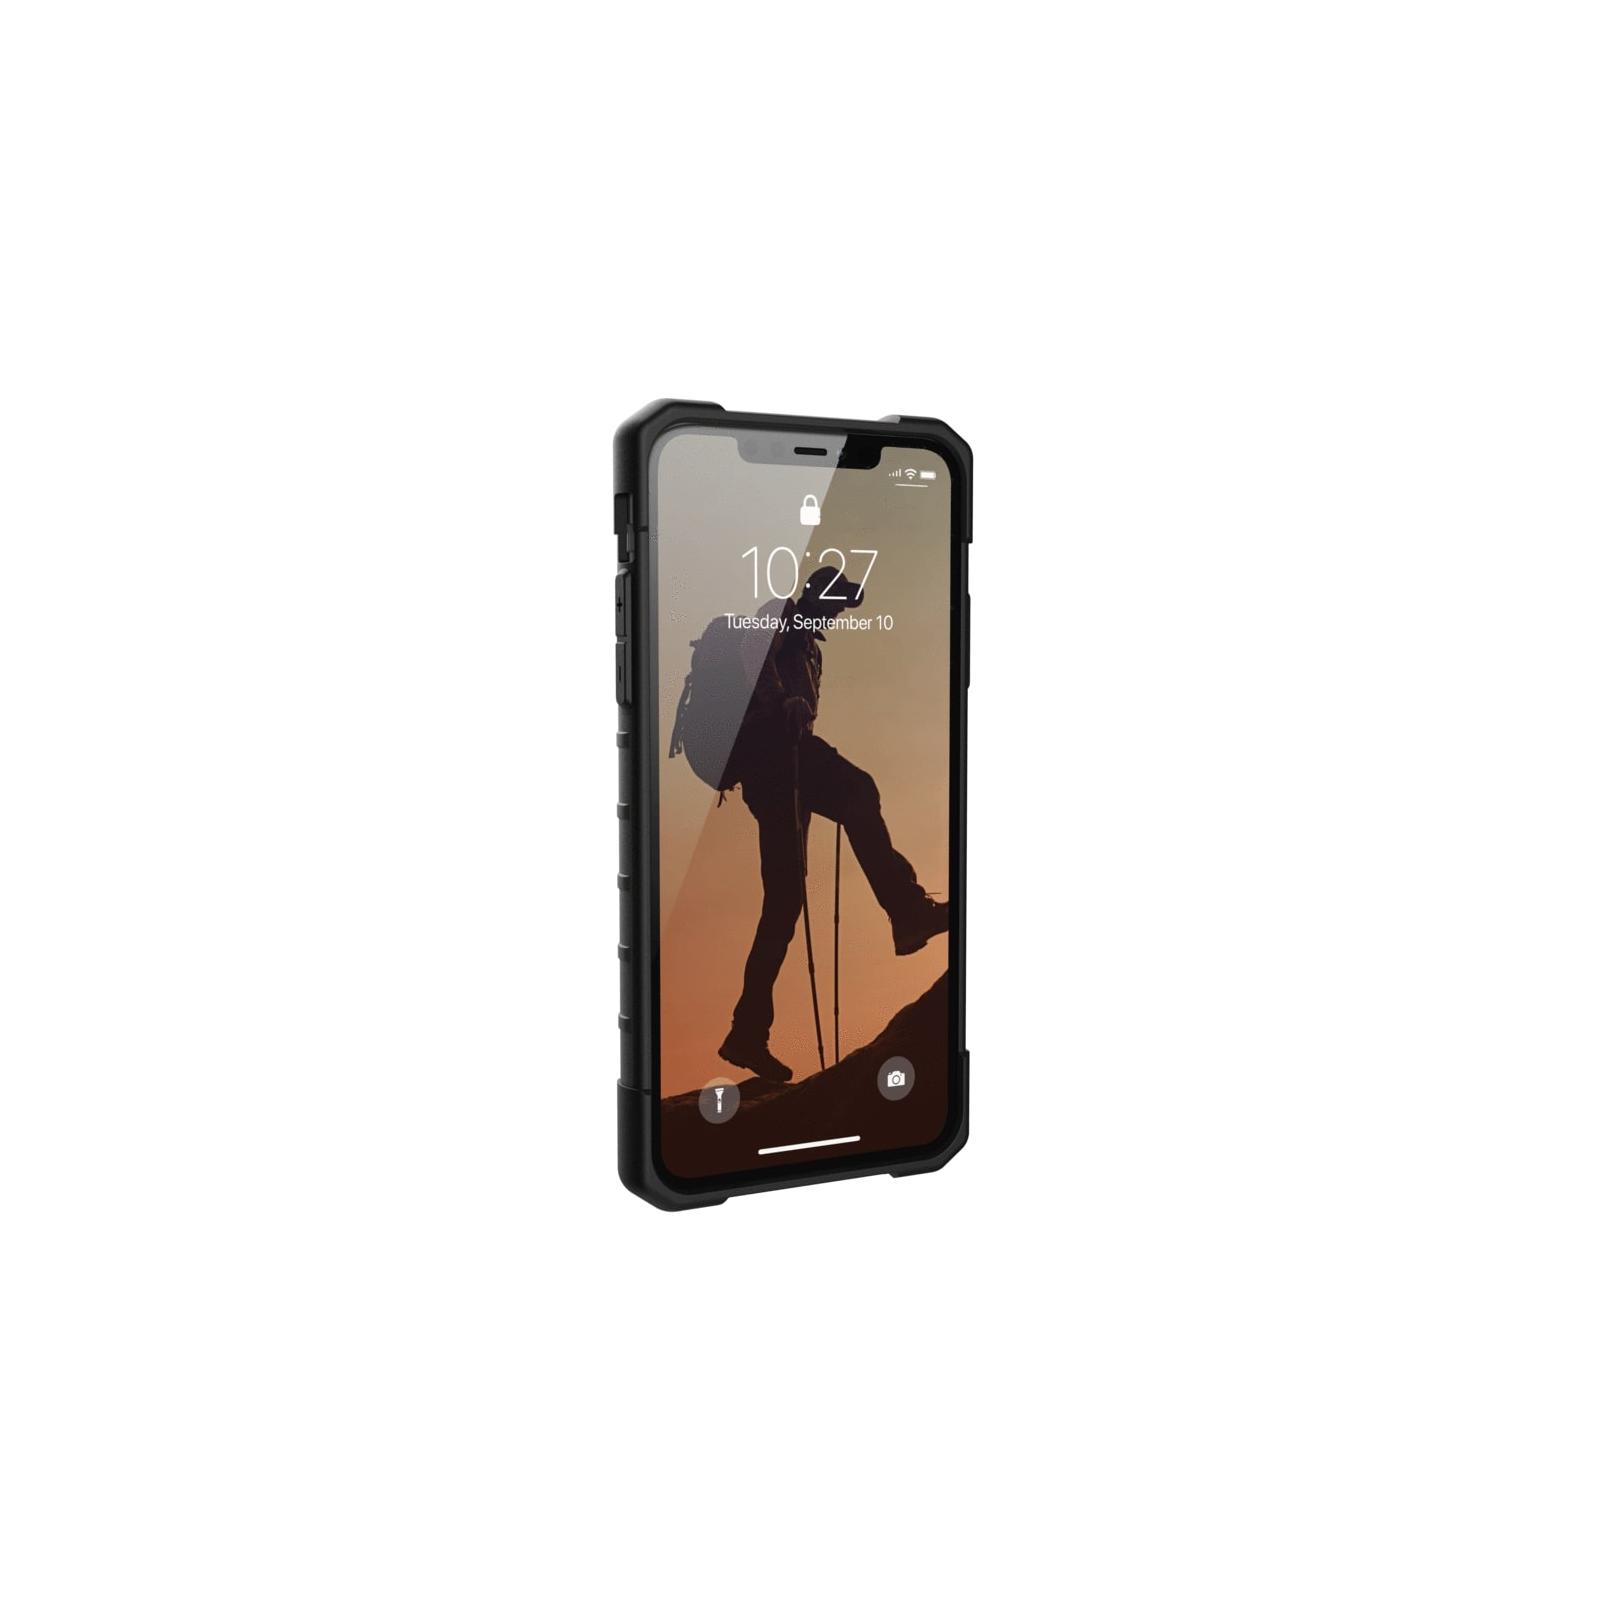 Чехол для моб. телефона Uag iPhone 11 Pro Max Pathfinder, Slate (111727115454) изображение 2